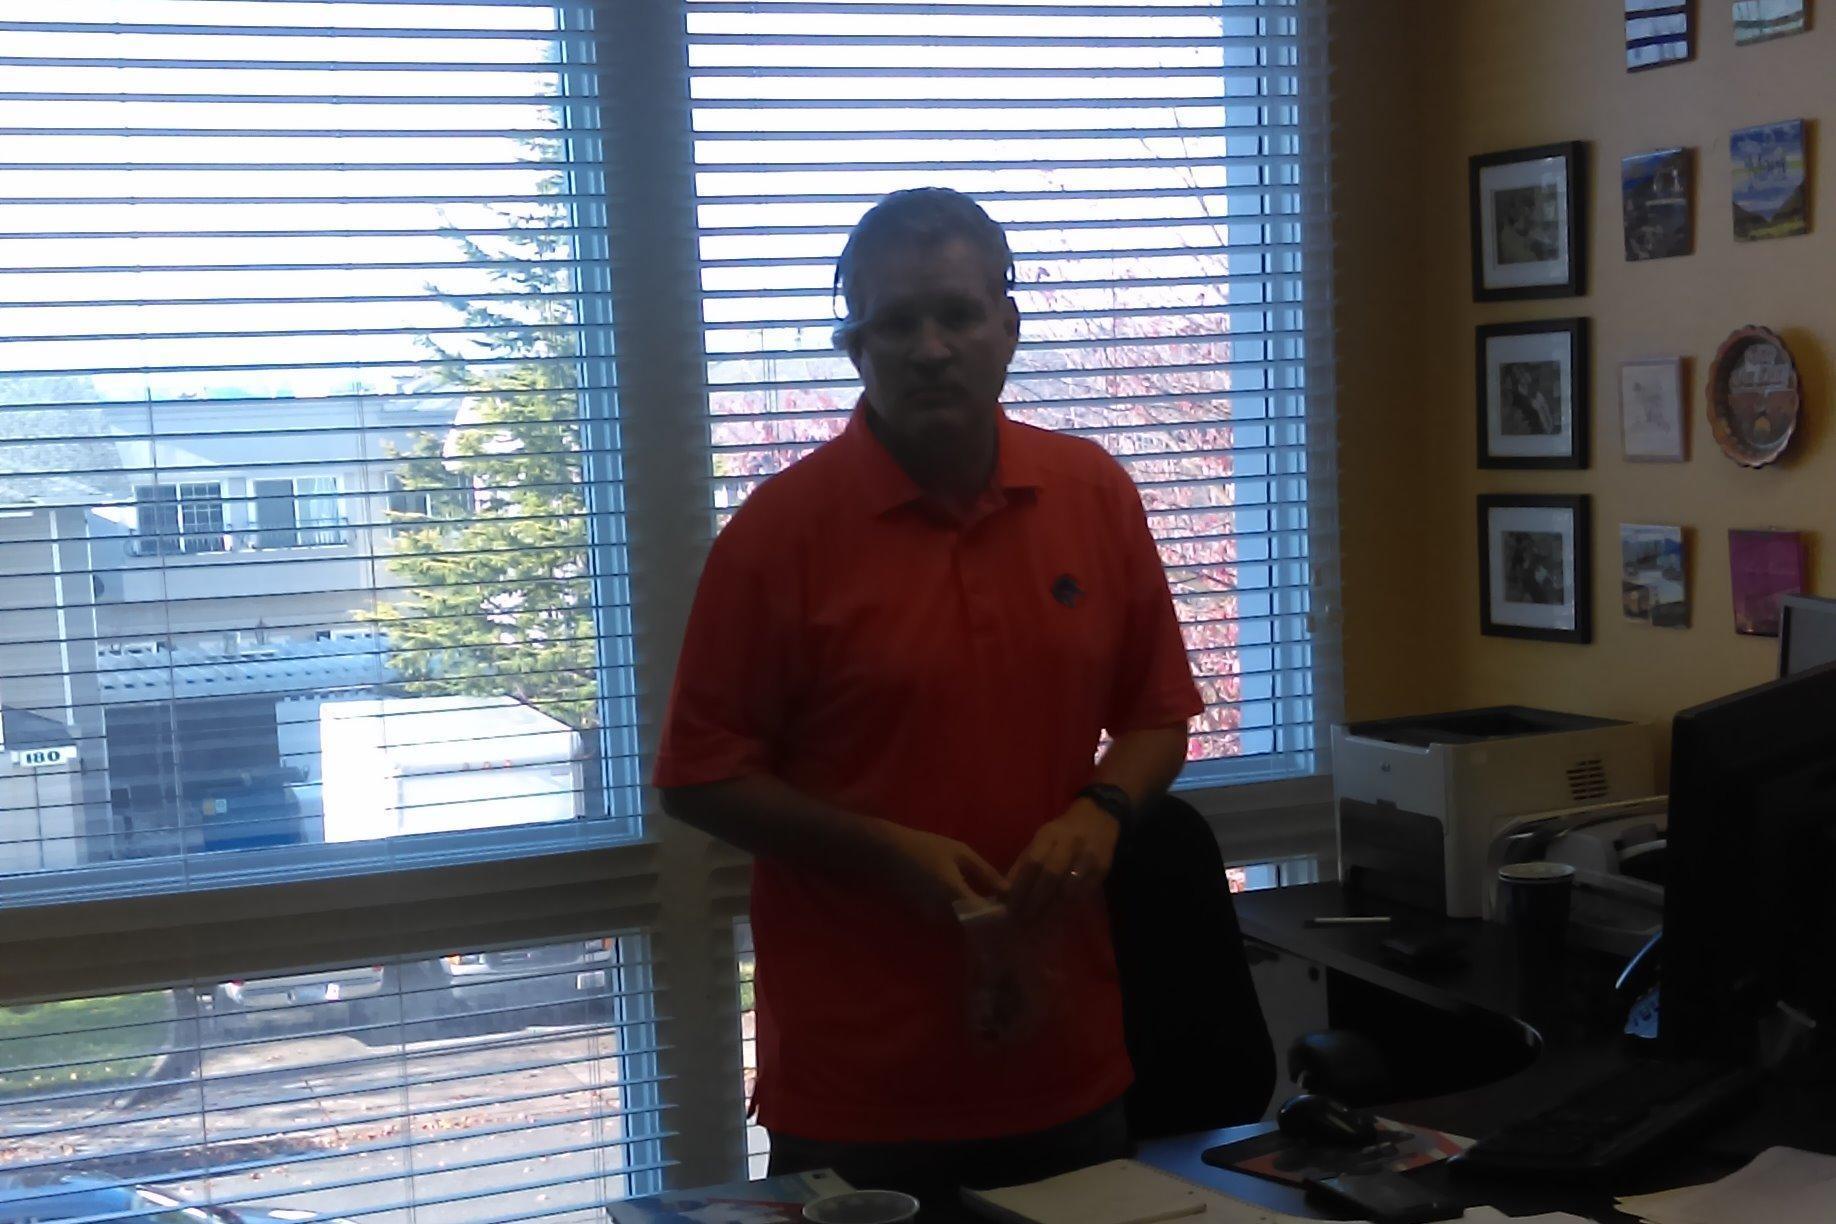 Jerry D Ljunggren: Allstate Insurance | 209 Dayton St, Ste 103, Edmonds, WA, 98020 | +1 (425) 412-3291